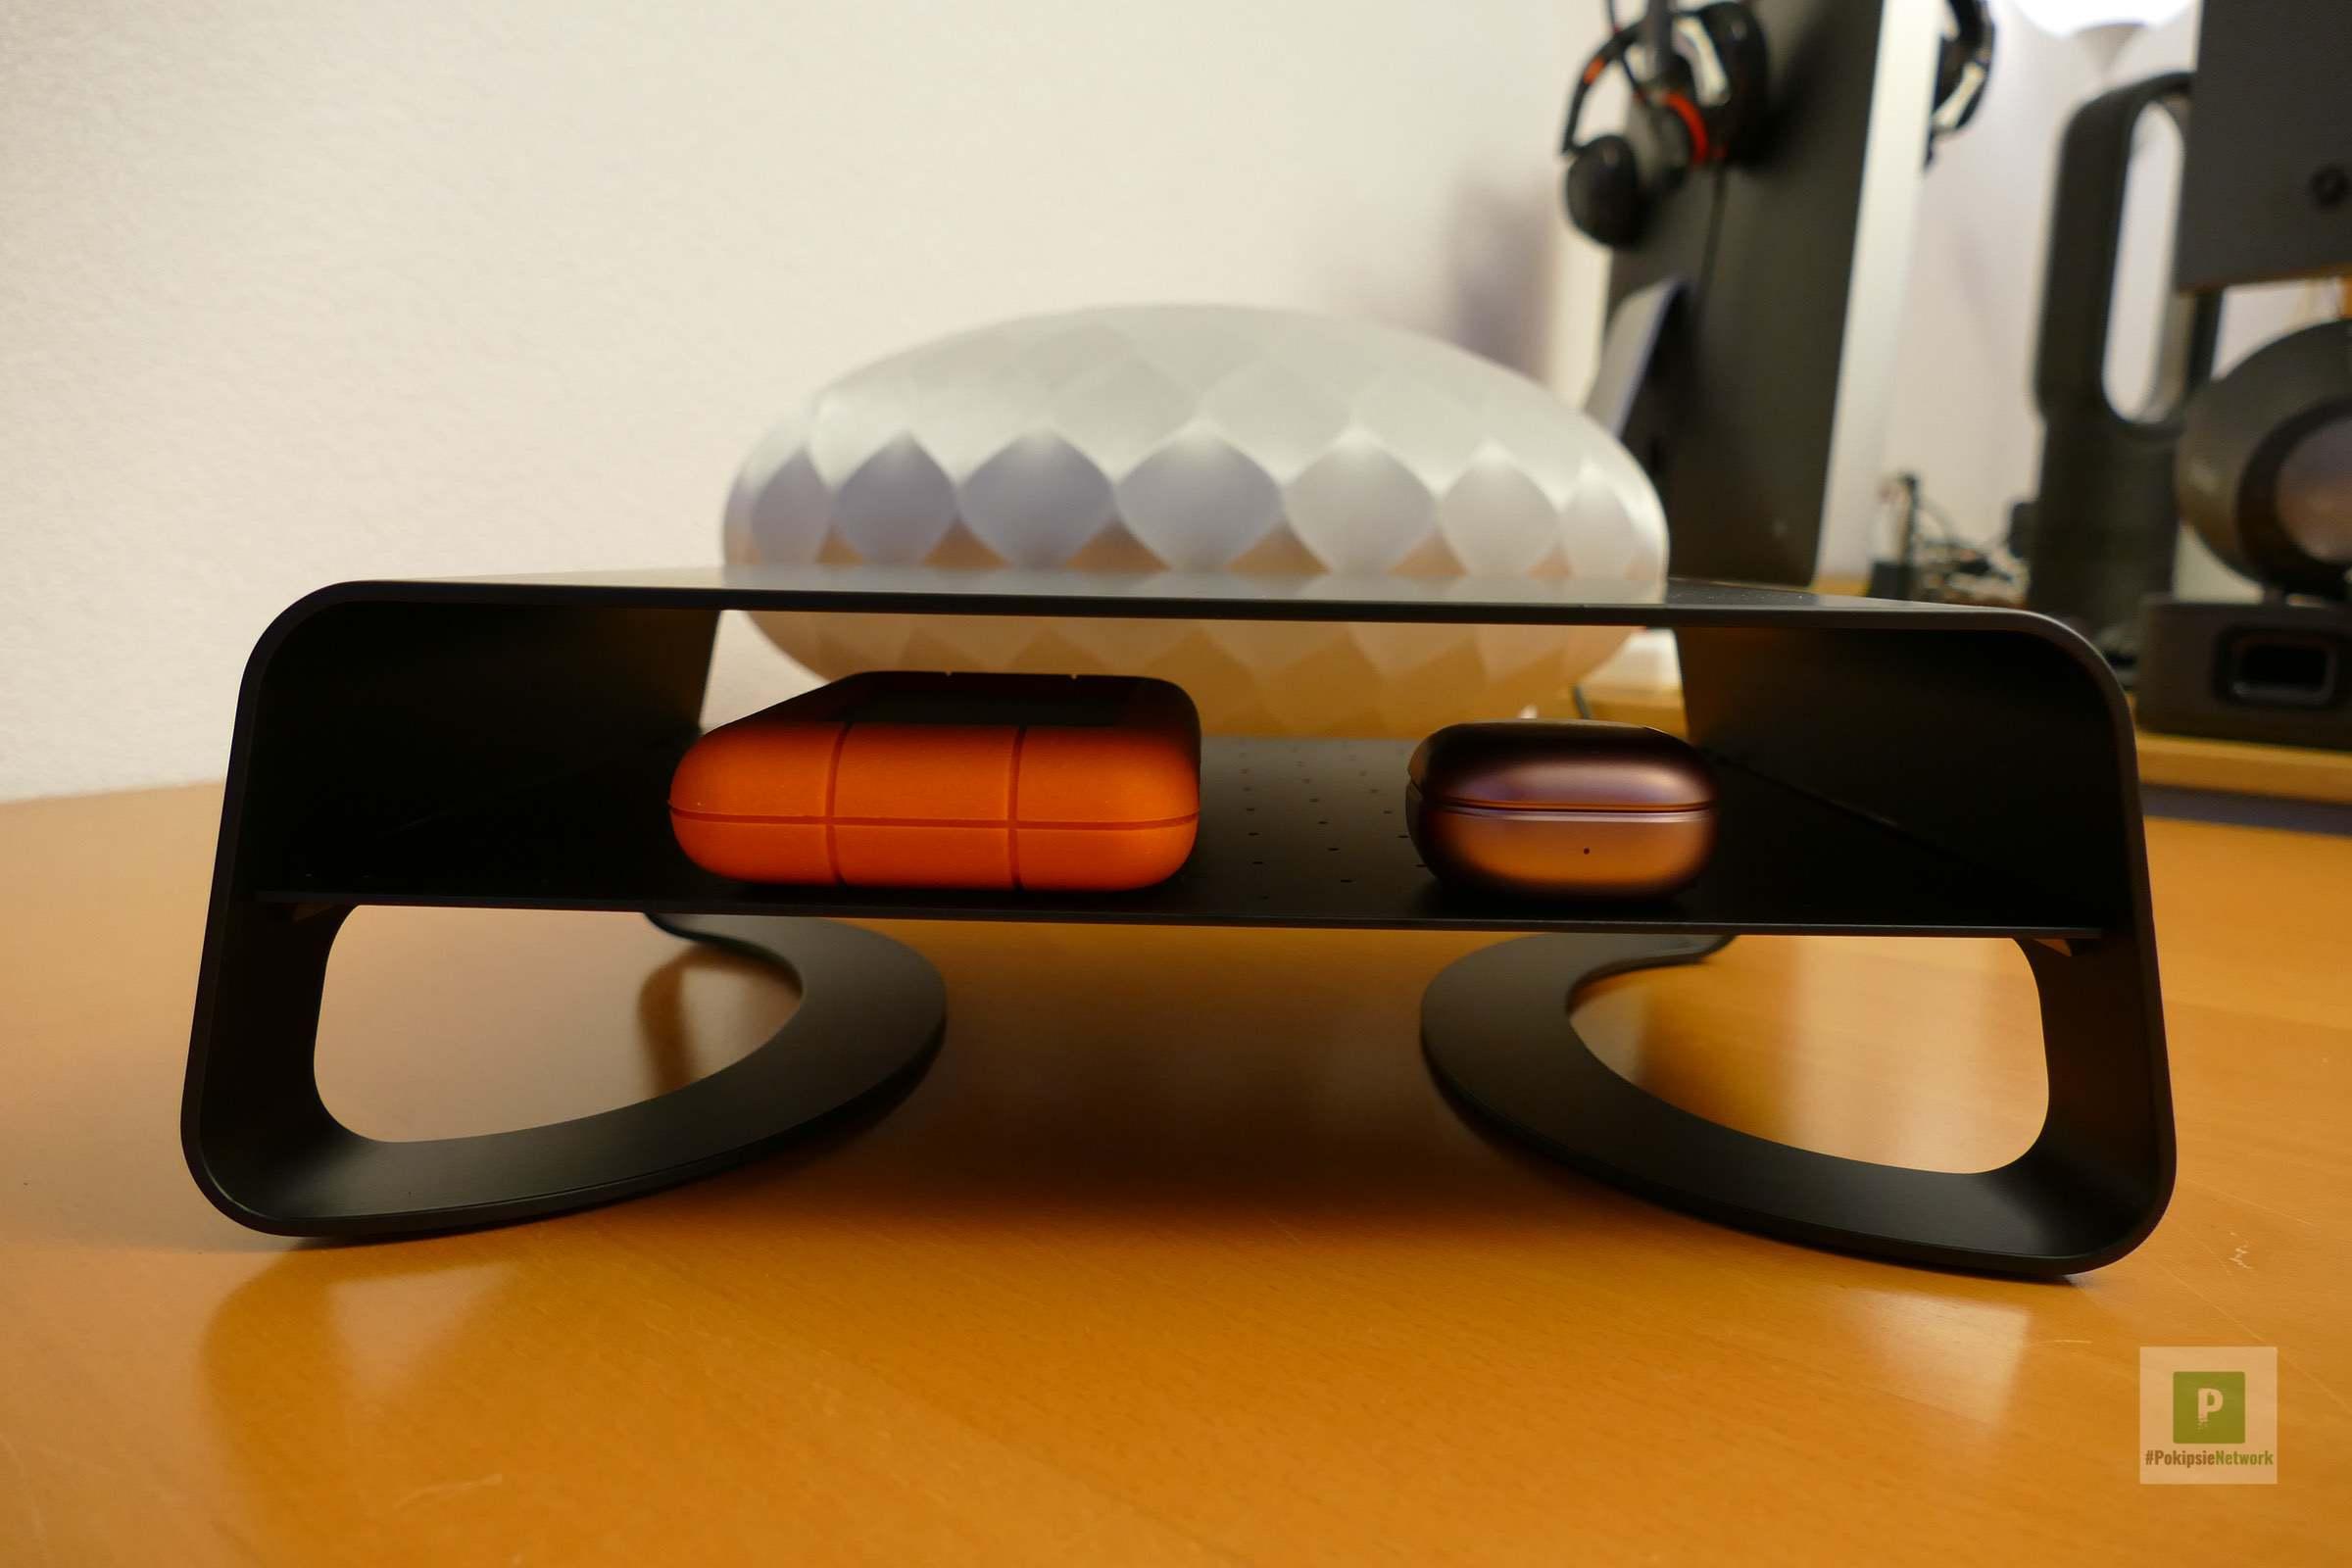 Festplatten und Kopfhörer